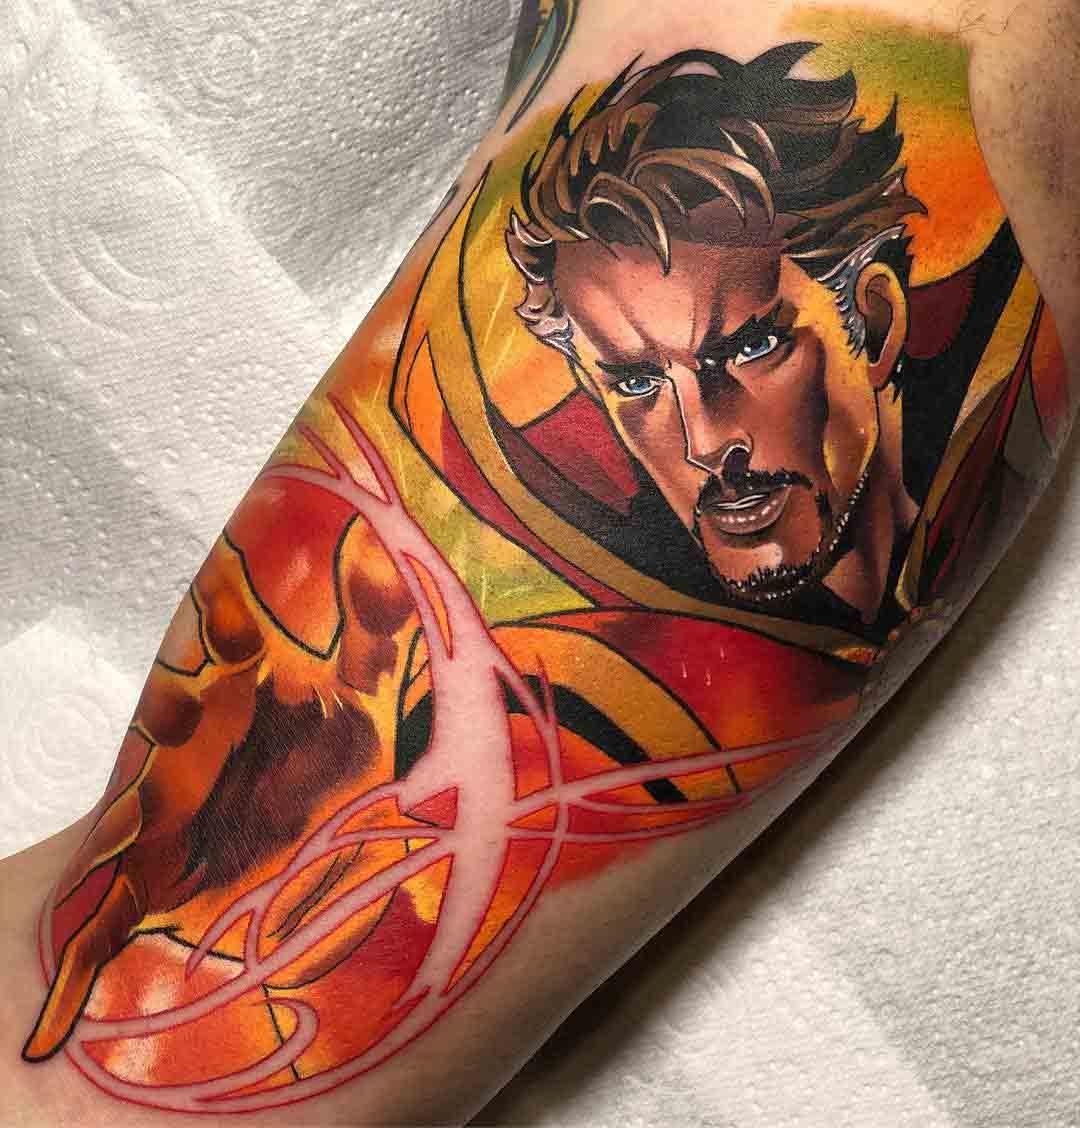 bicep tattoo dr. strange